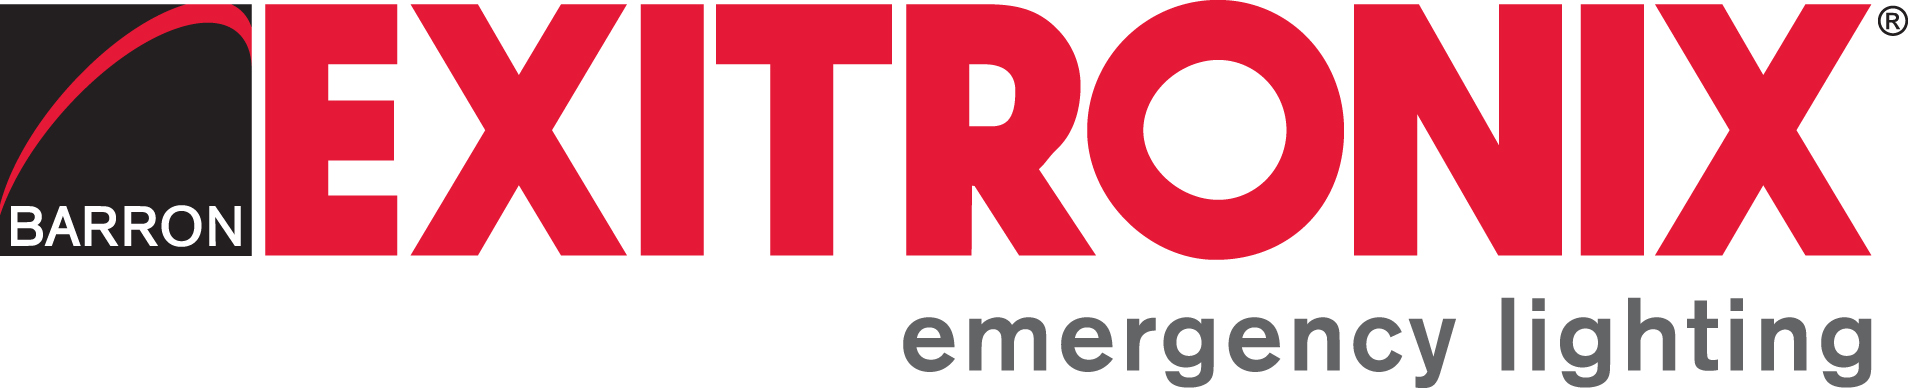 exitronix_logo.jpg